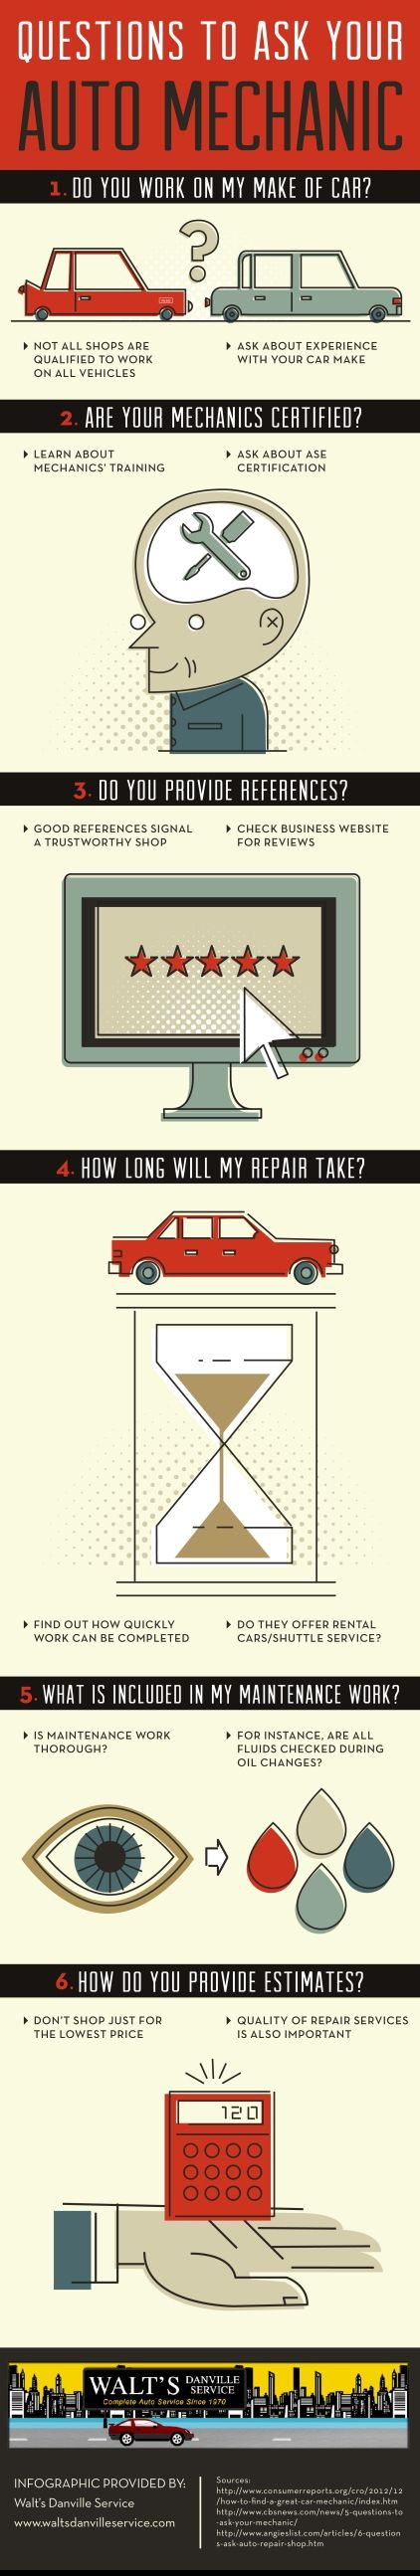 Best 25+ Auto mechanic ideas on Pinterest | Car repair near me ...